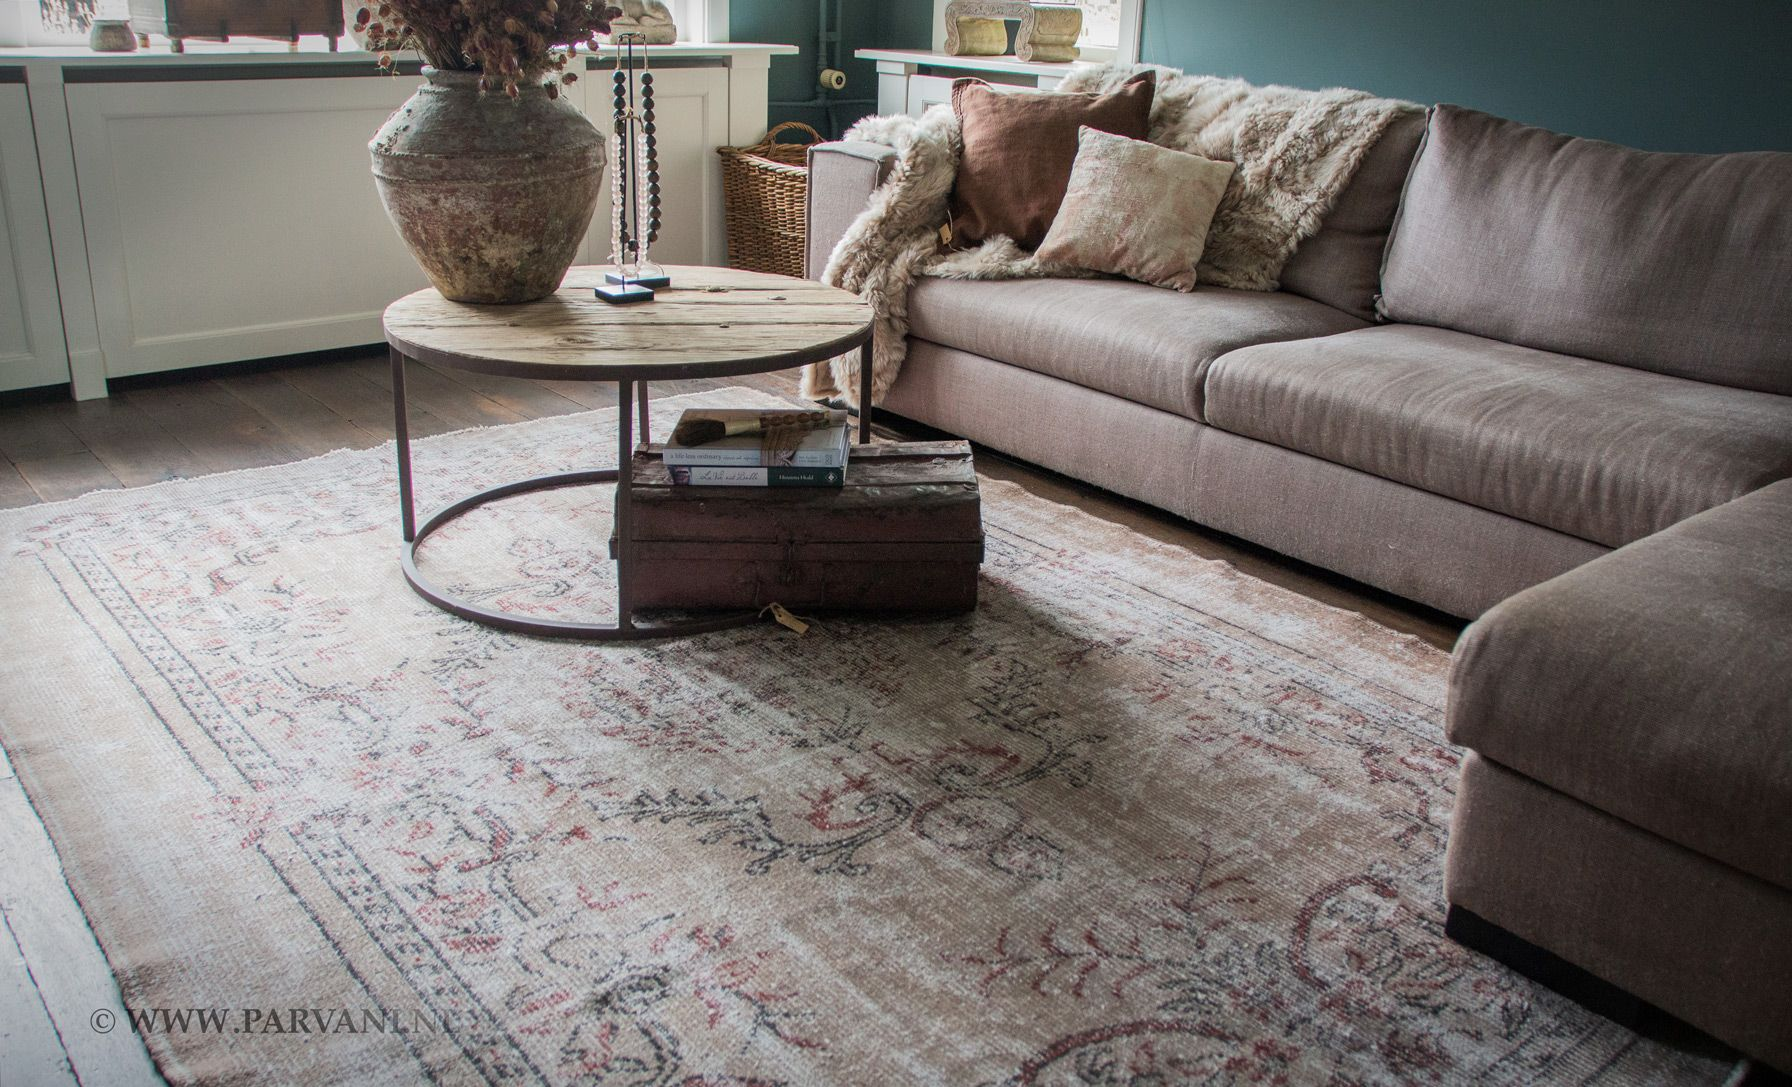 Parvani Vintage vloerkleed beige oudroze naturel